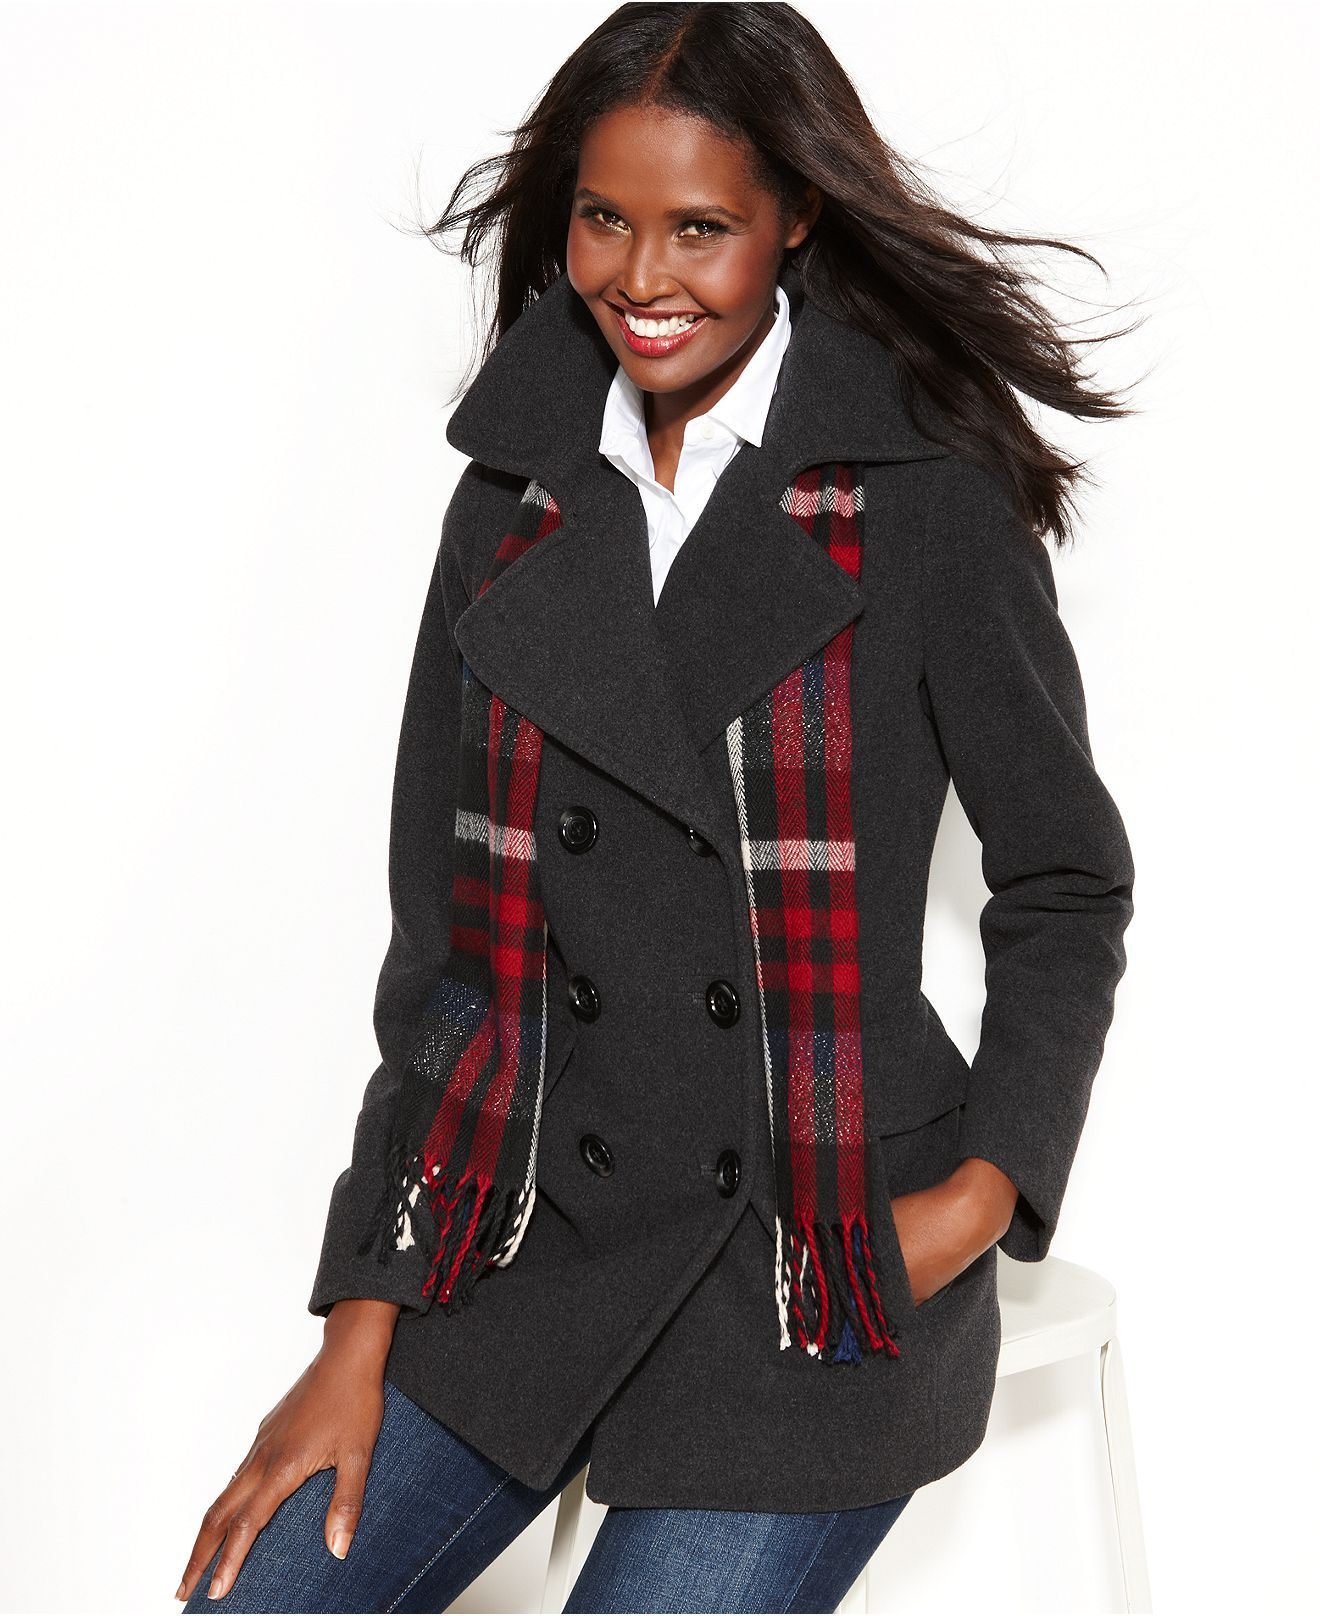 London Fog Coat, Double-Breasted Pea Coat & Plaid Scarf - Coats - Women - Macy's